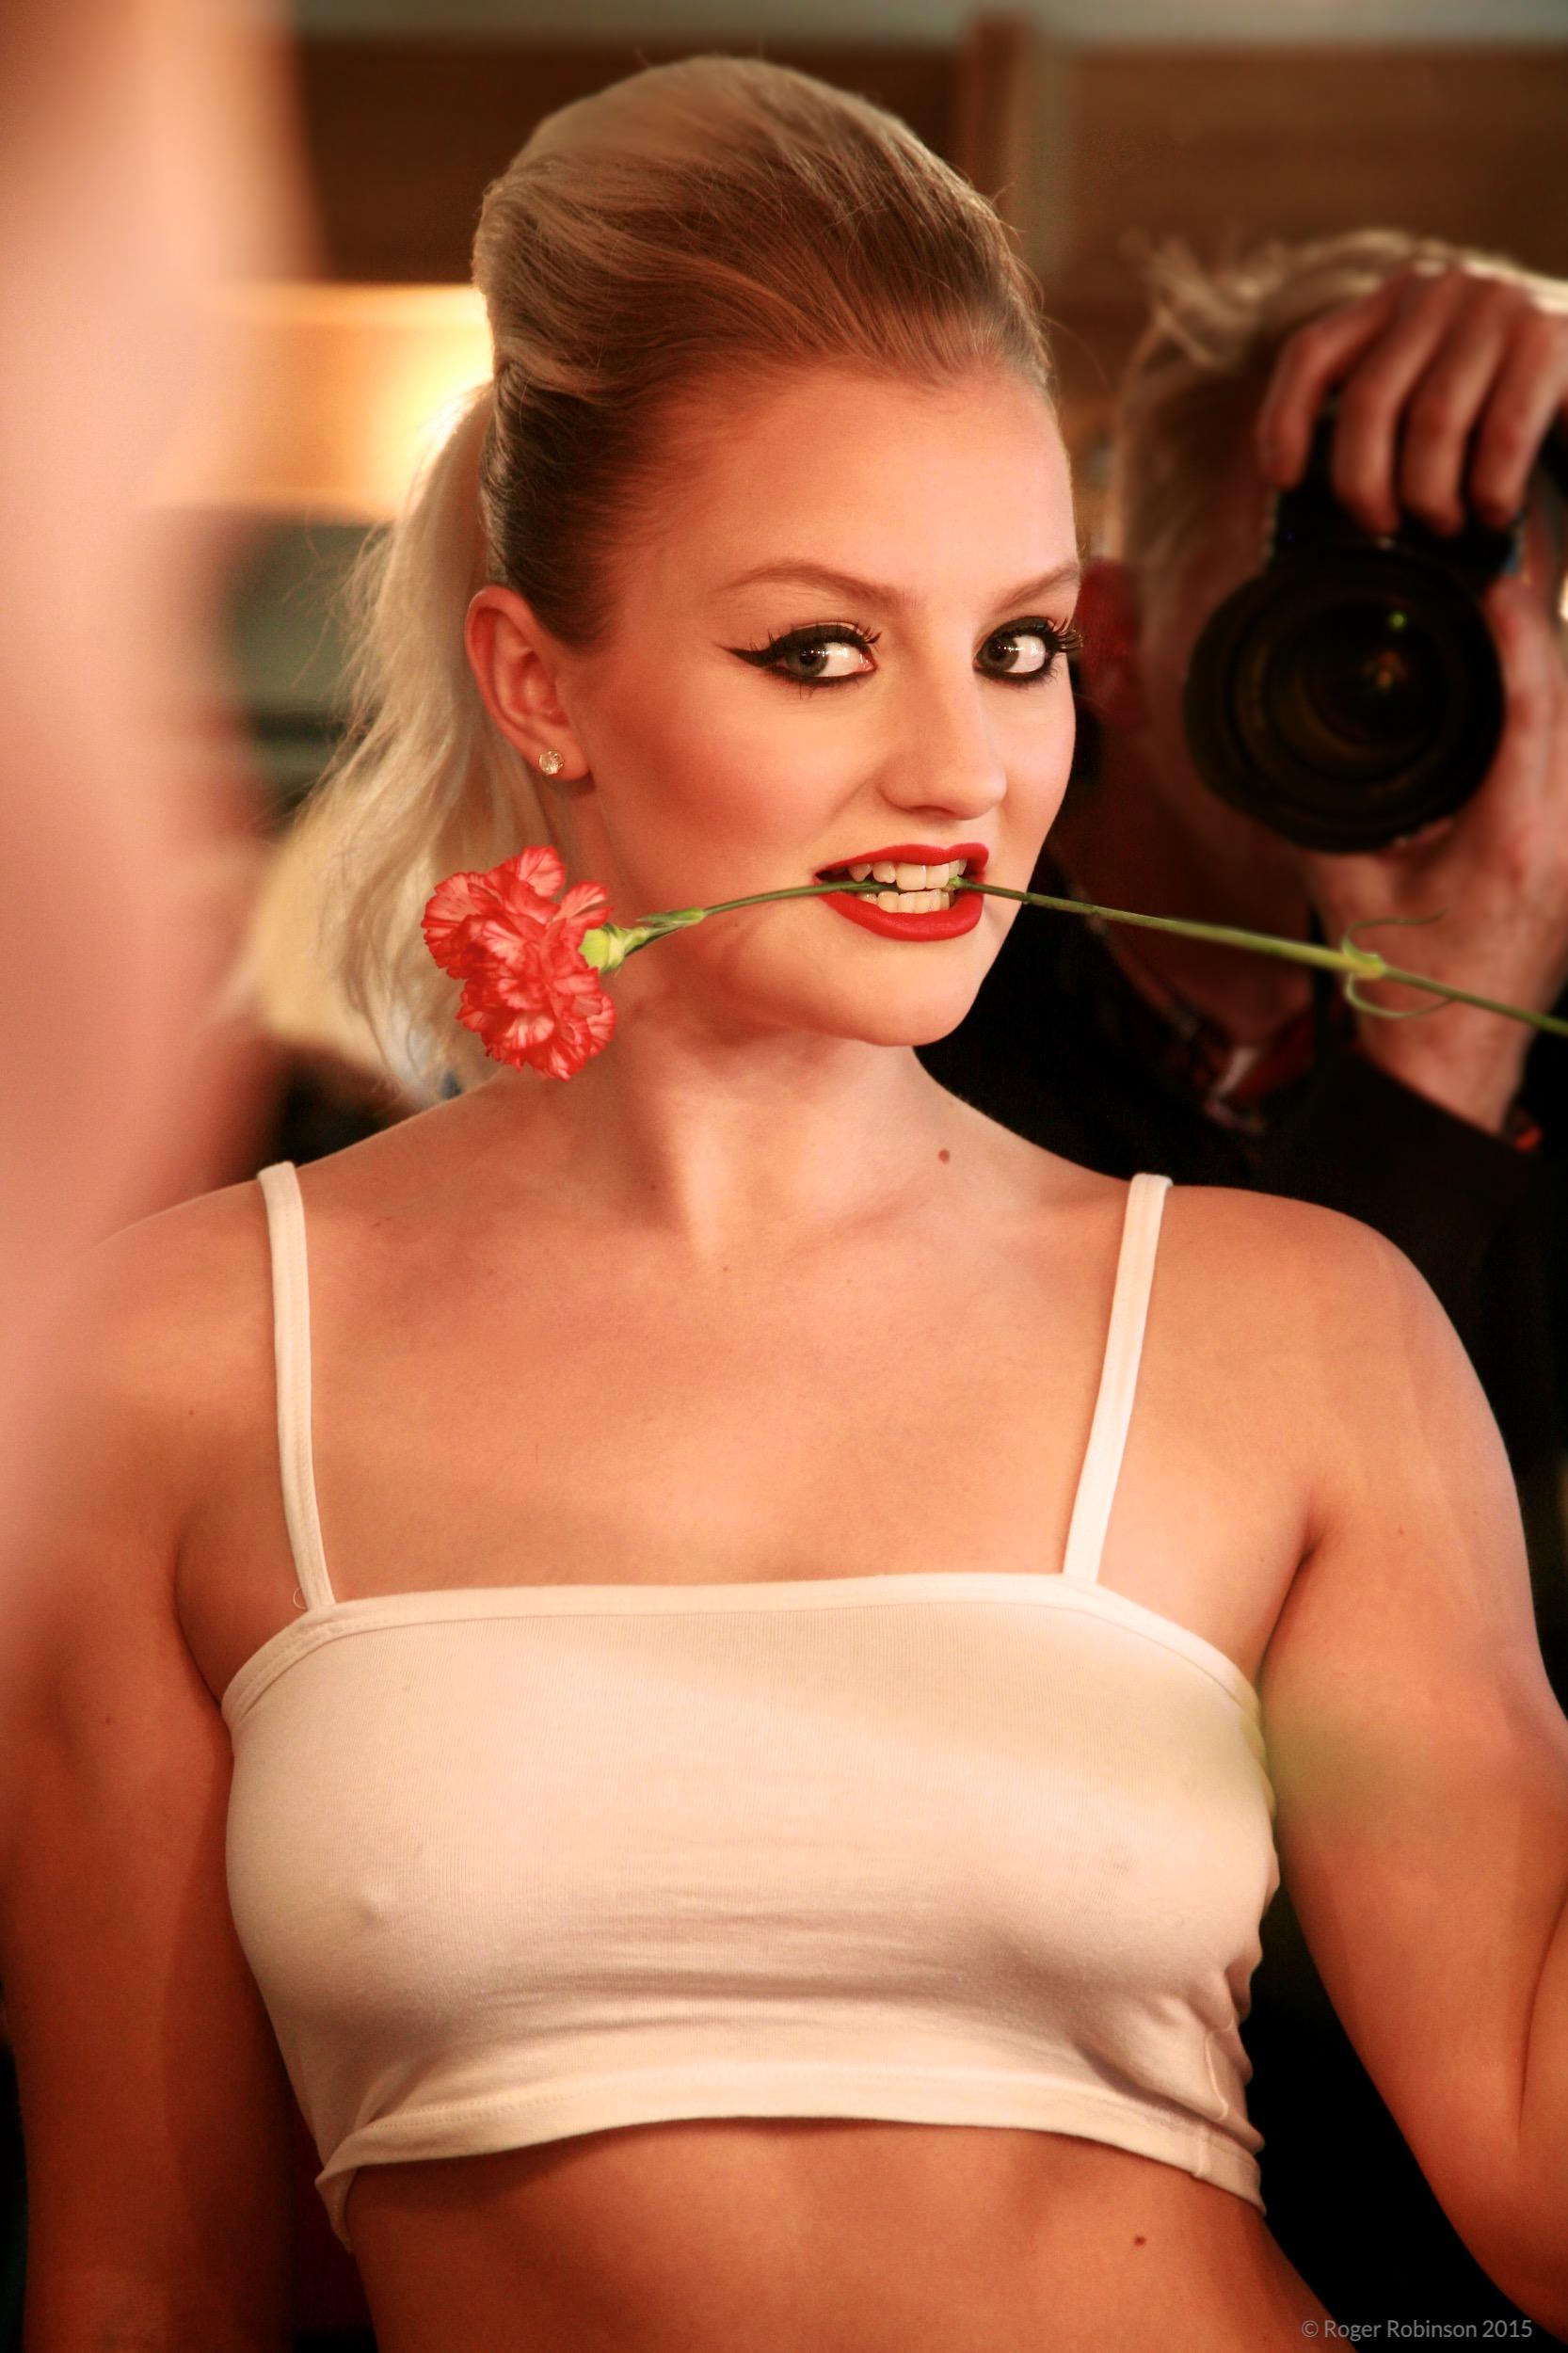 Jessica Ladley